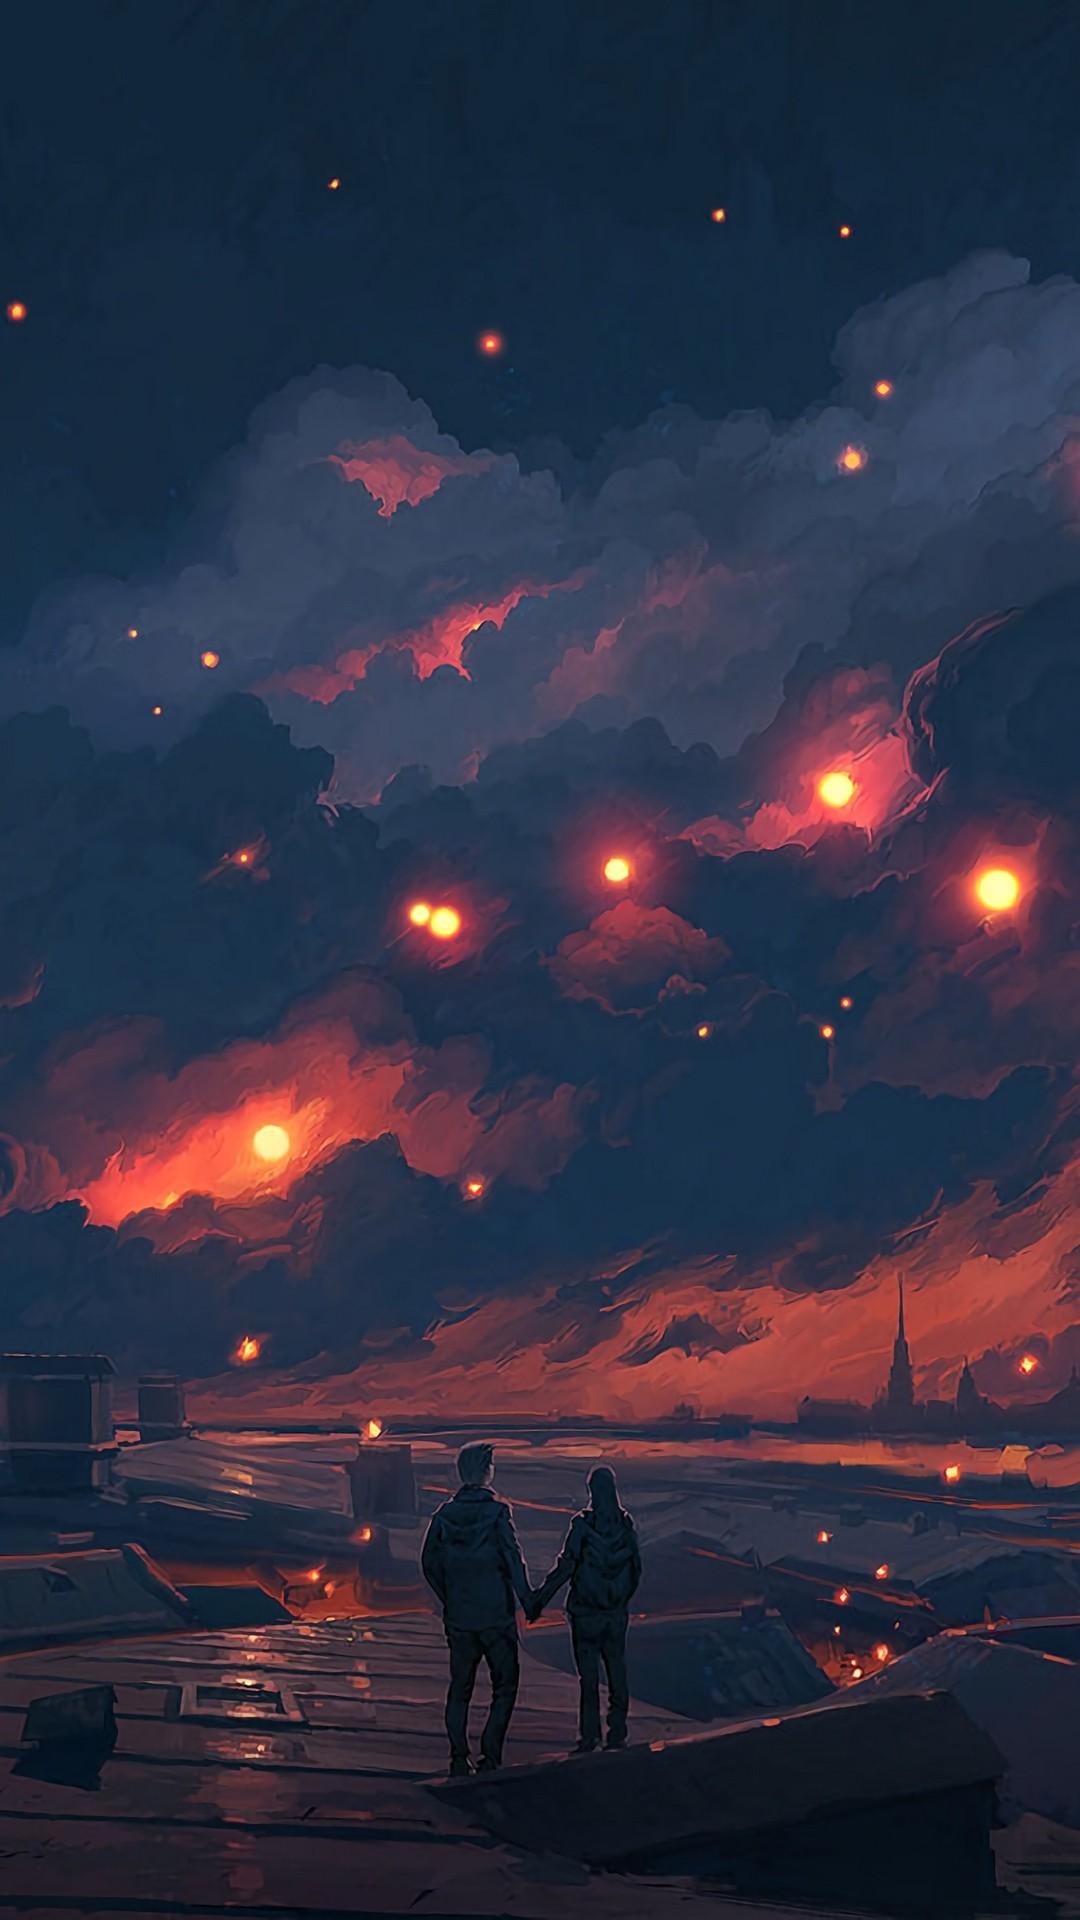 Free Couple, night, art, clouds, romance, love phone wallpaper by davisd64